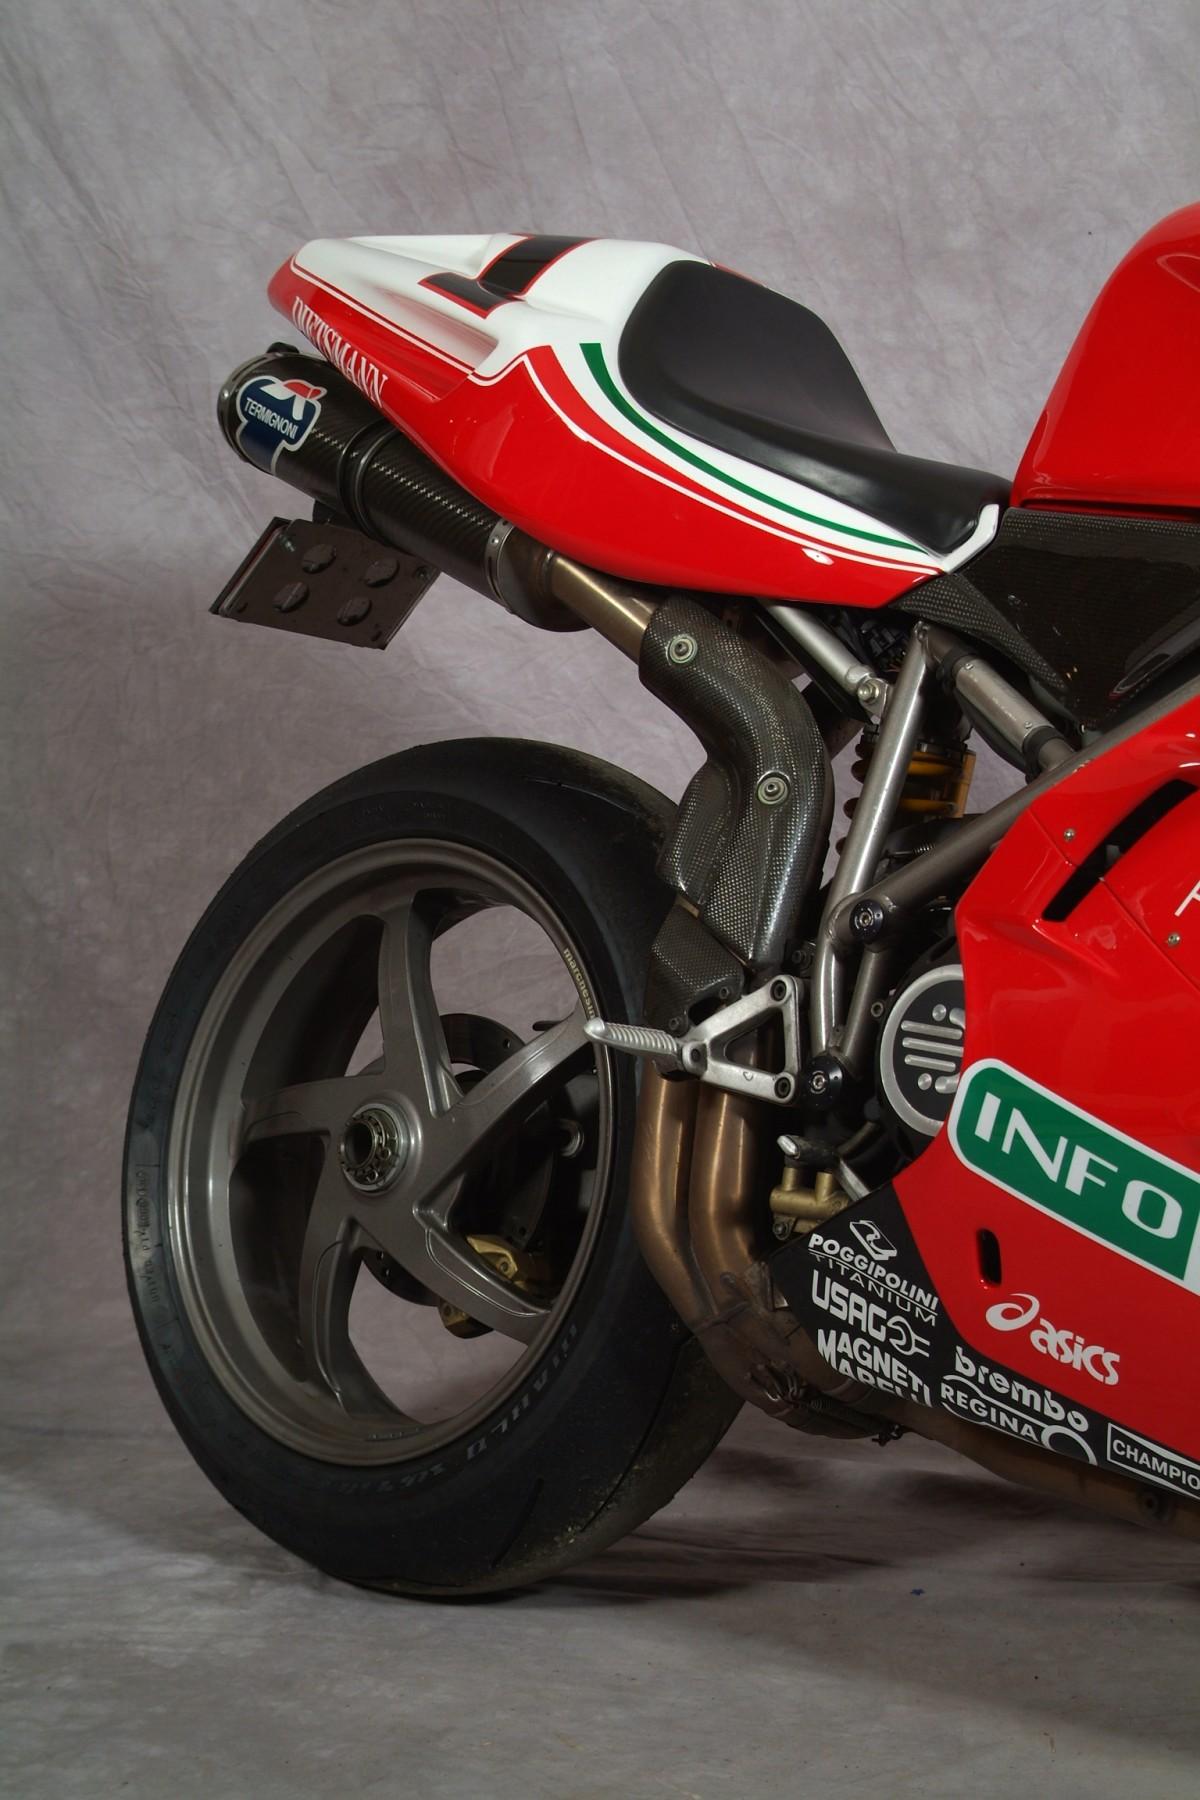 2000 Ducati 996 SPS - Mark996 - Shannons Club